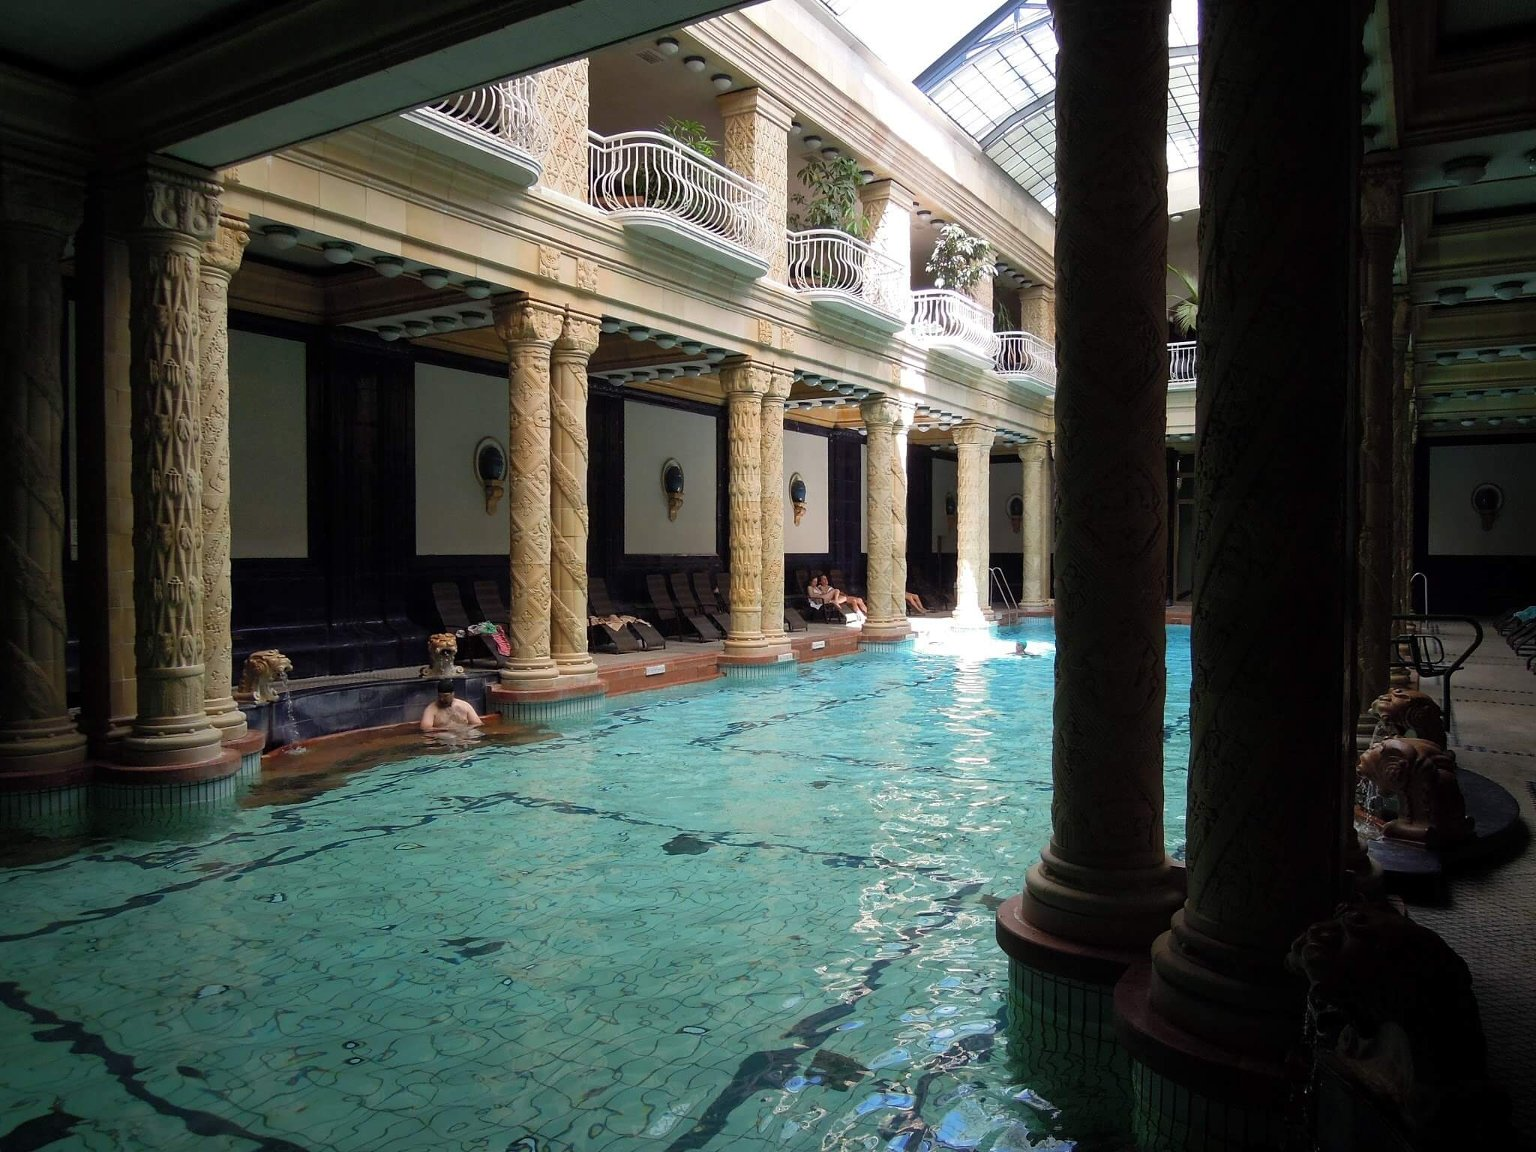 Купальня Геллерт - лучшая купальня Будапешта